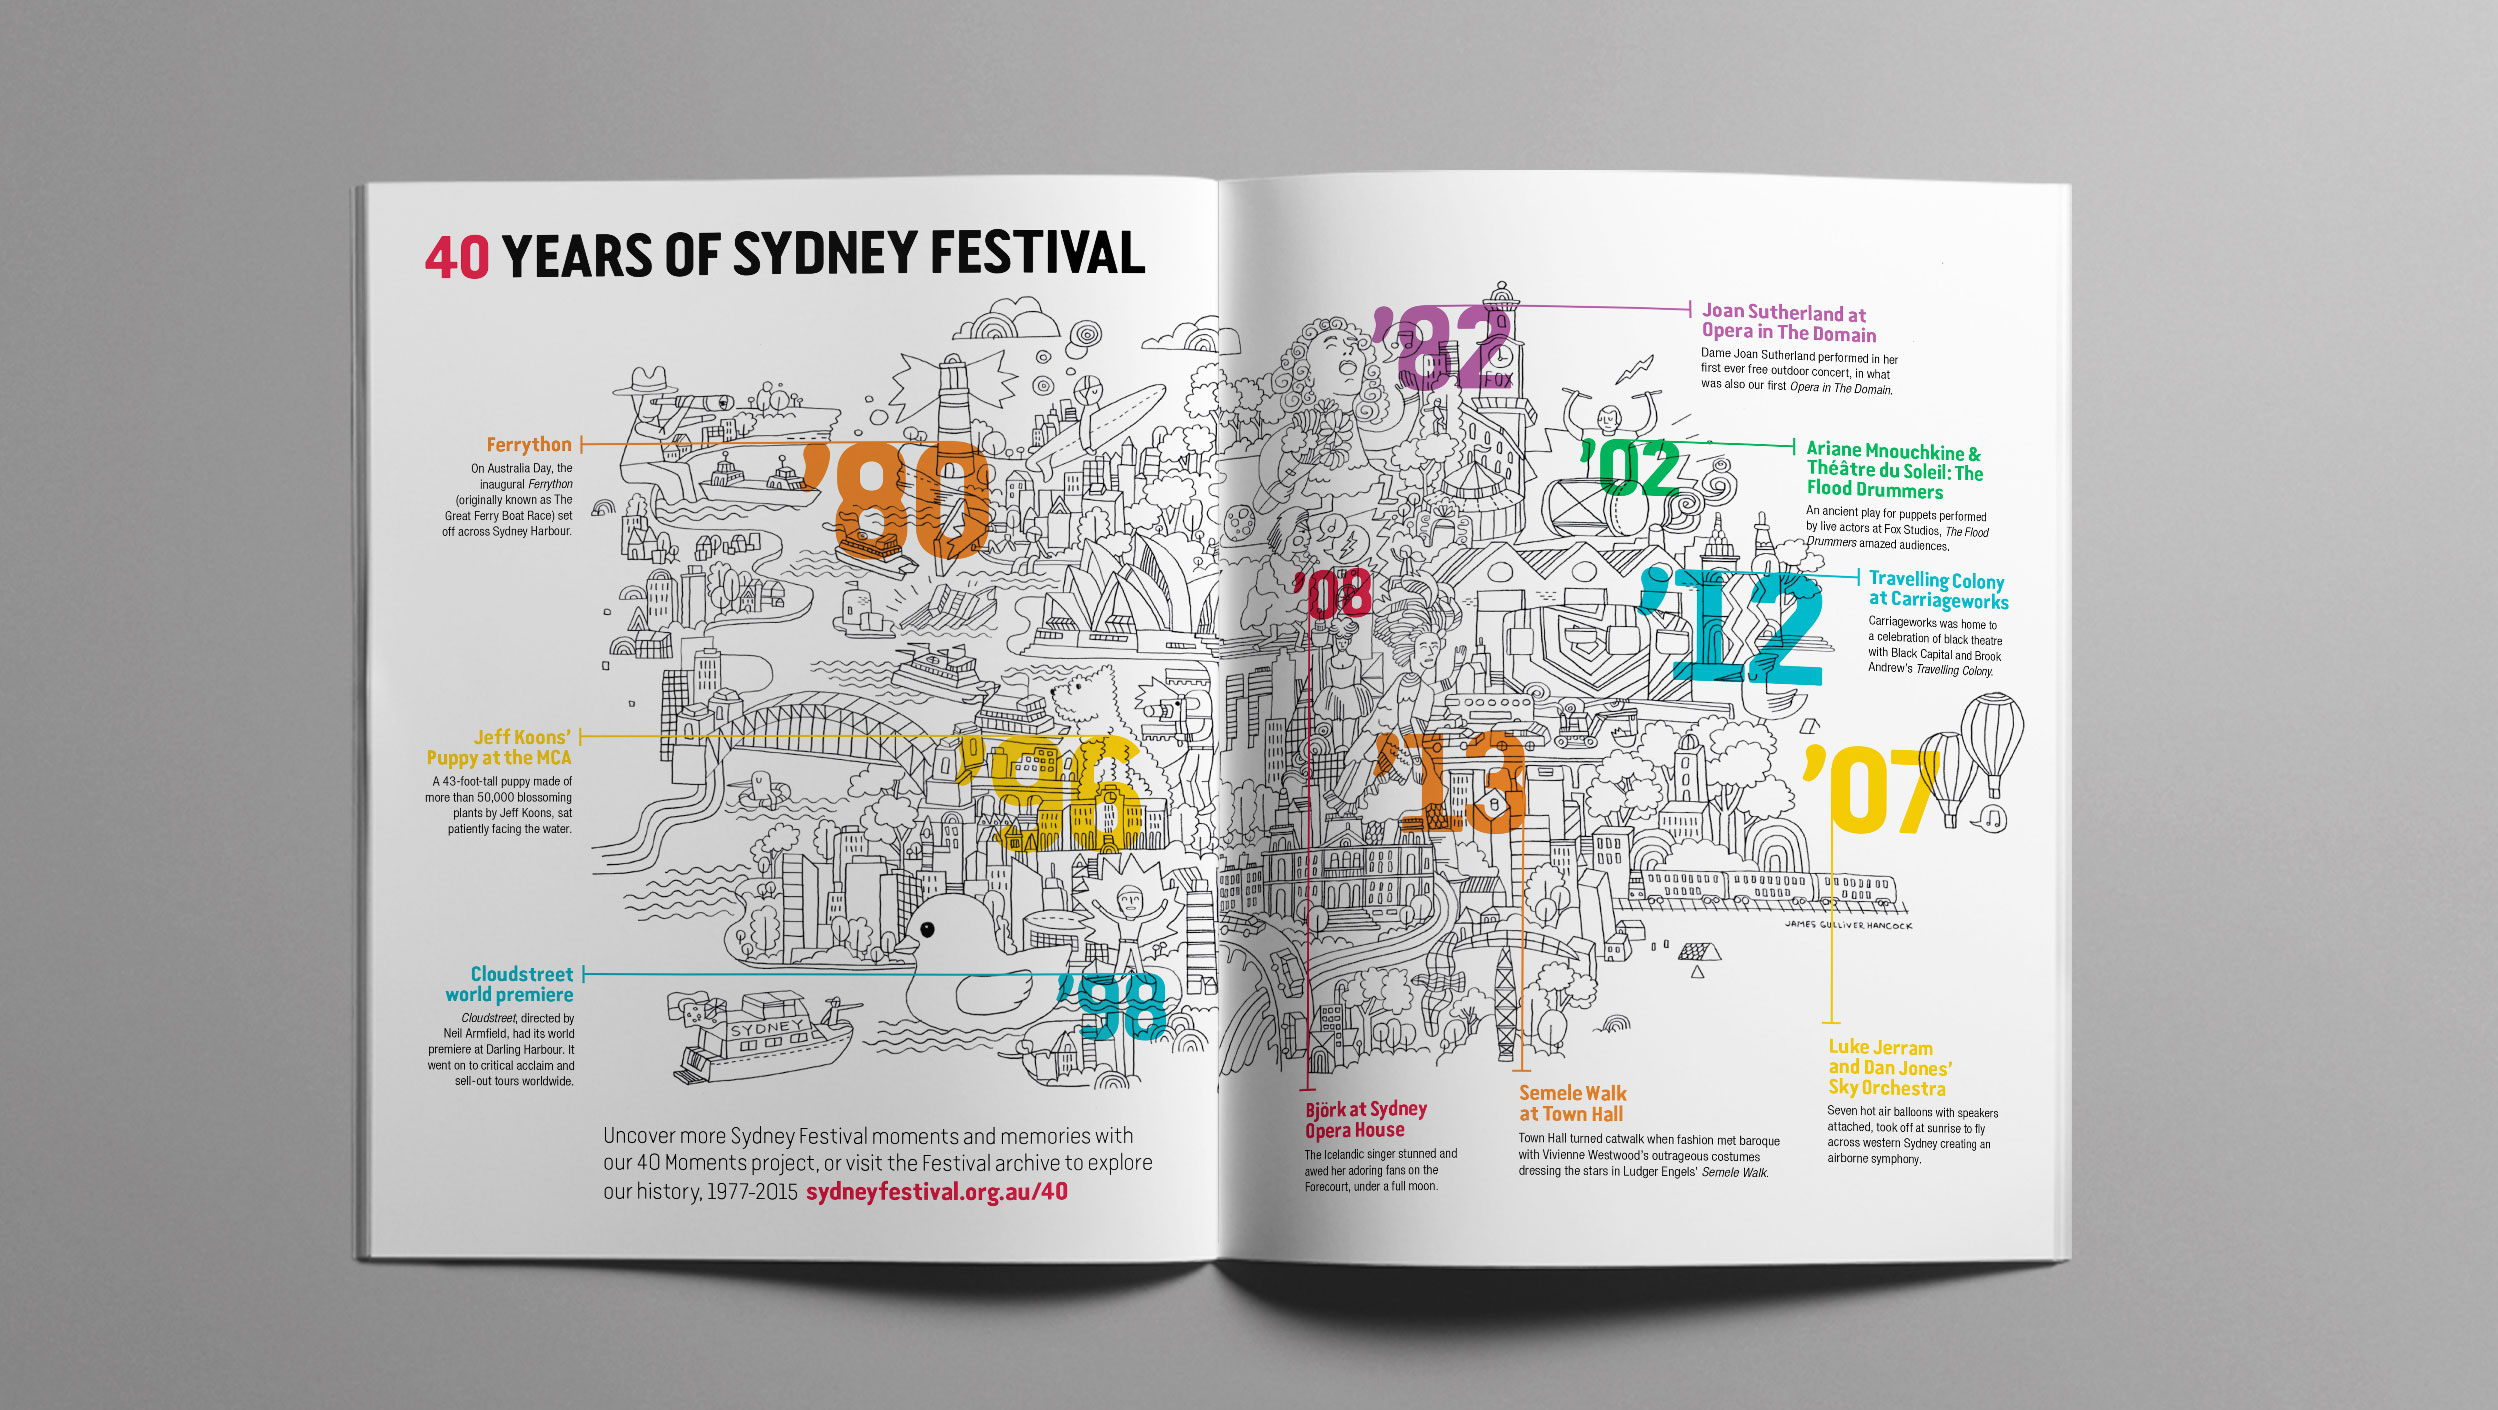 SF-2016-Brochure-Illustrration-R